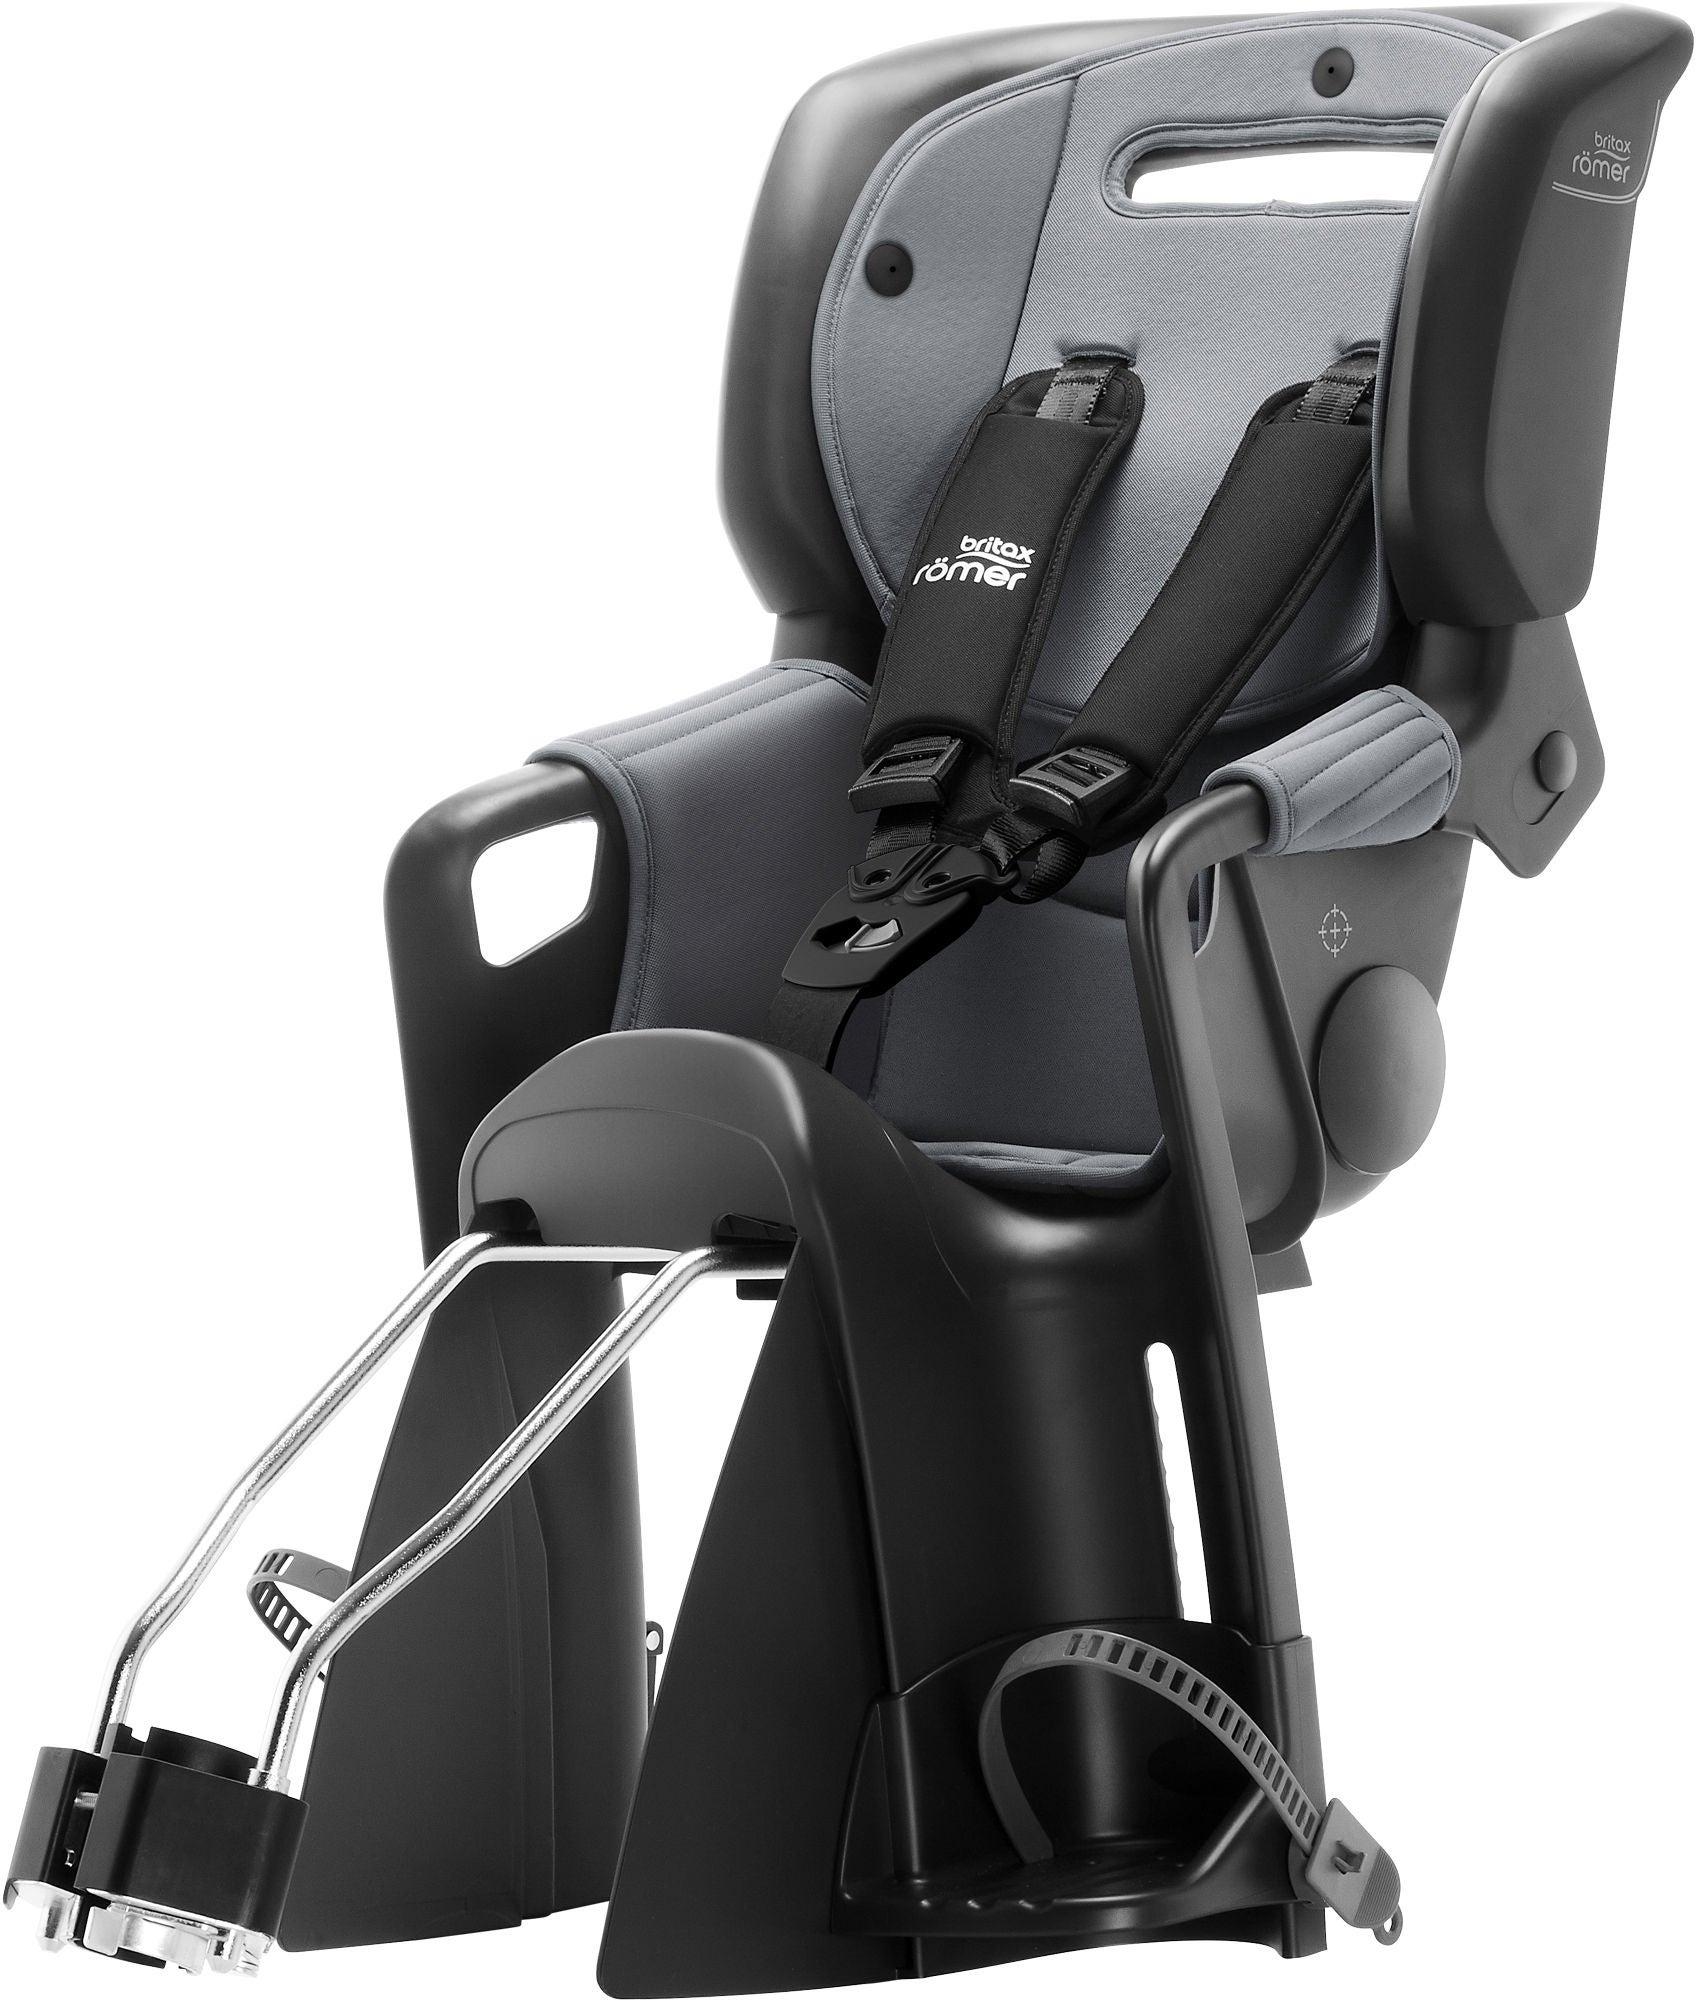 Britax Römer Jockey 3 Comfort Cykelsits, Black/Grey